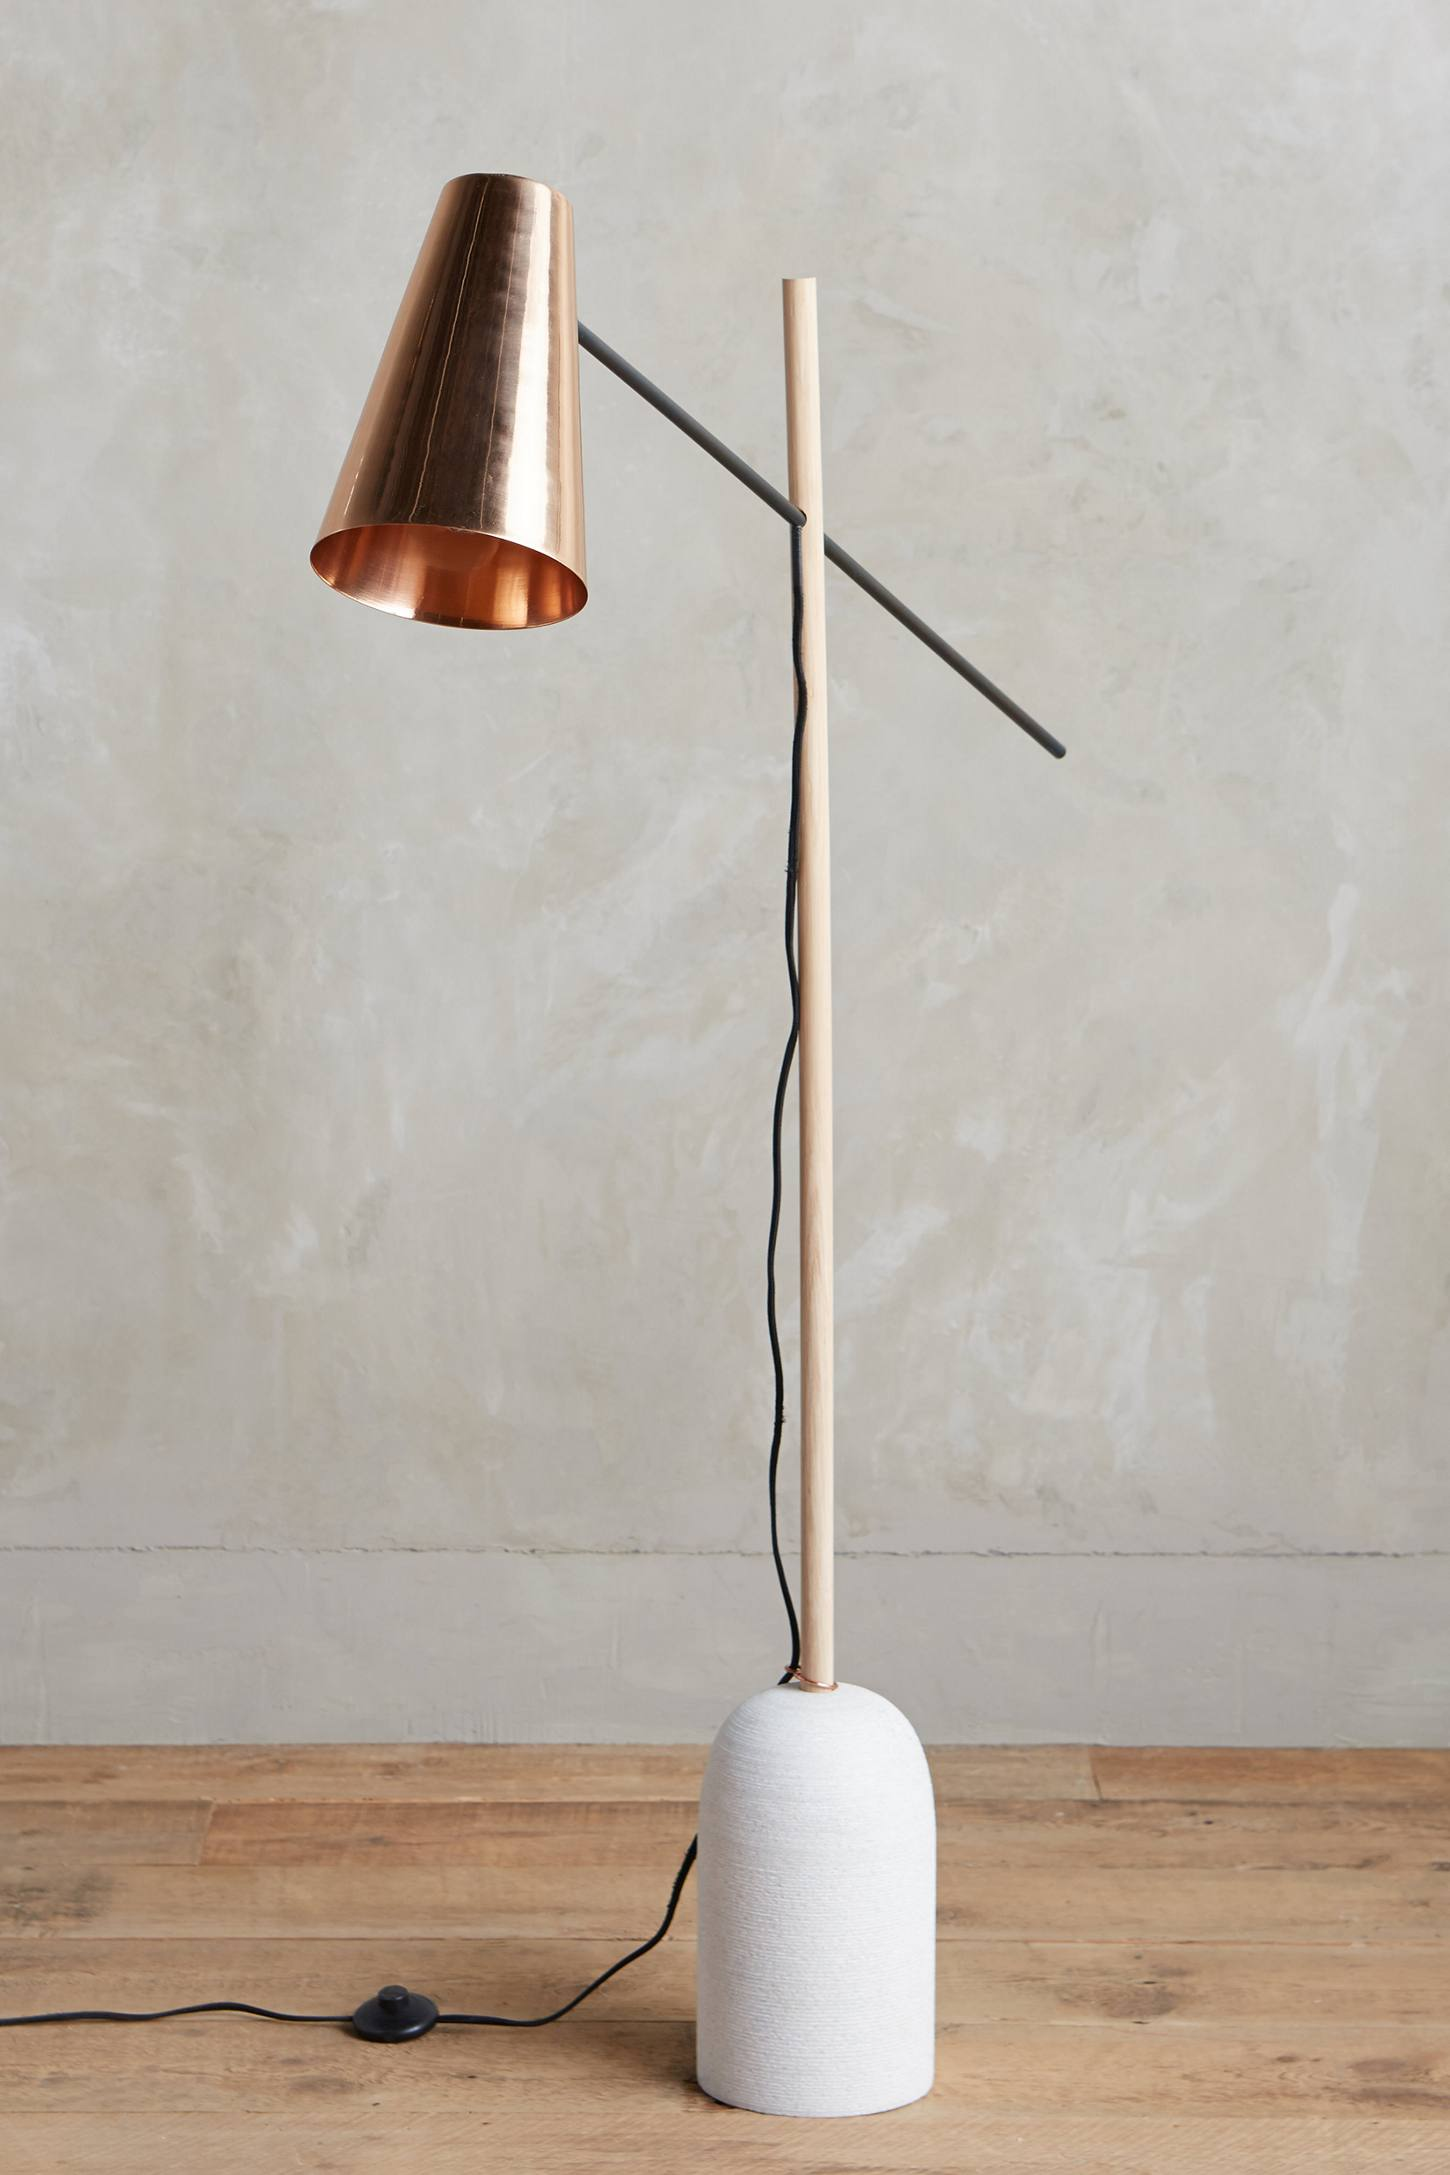 The Warm Glow of Copper Decor